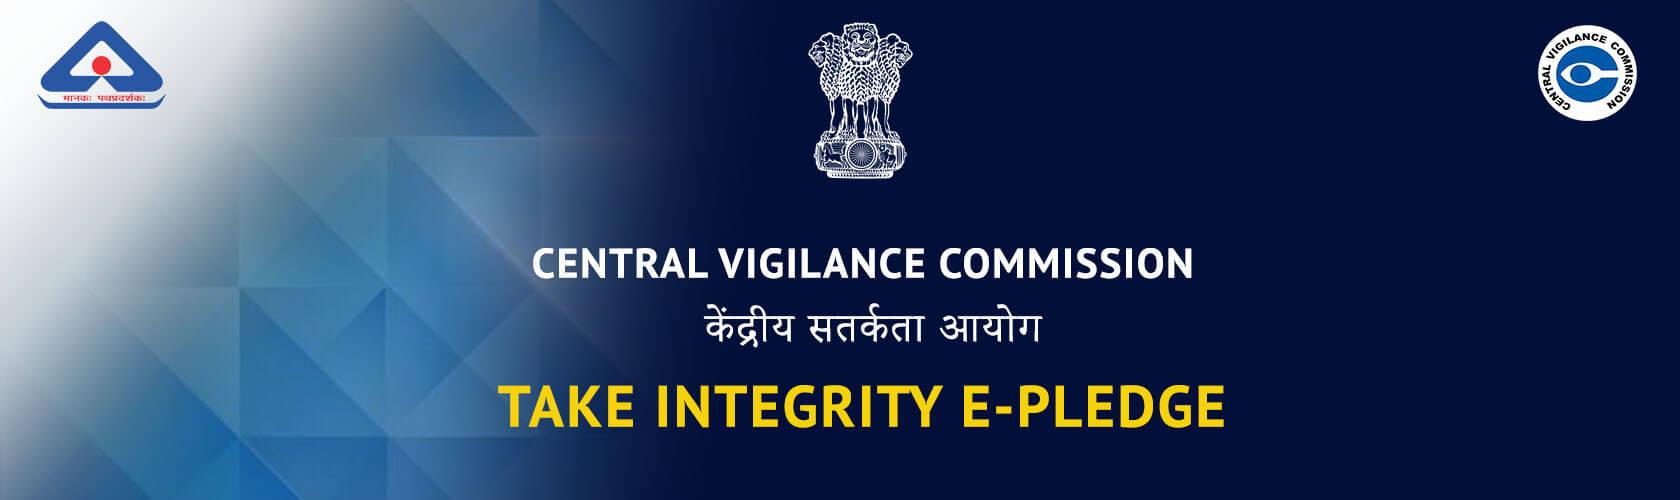 604932148(English) vigilance-E-Pledge